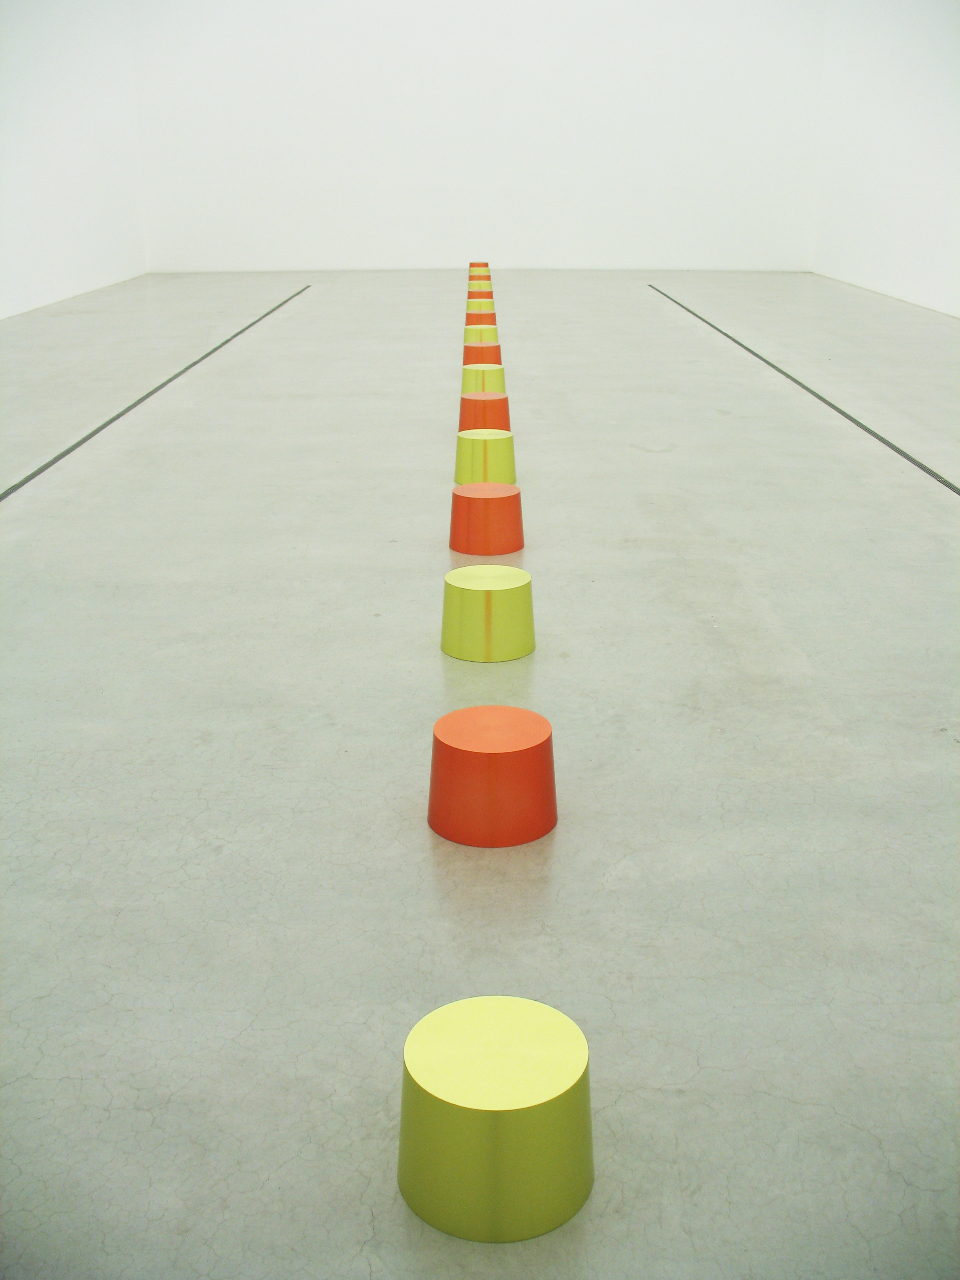 TKSc 2011 - 21st century contemporary art museum exhibition space11_11.jpg